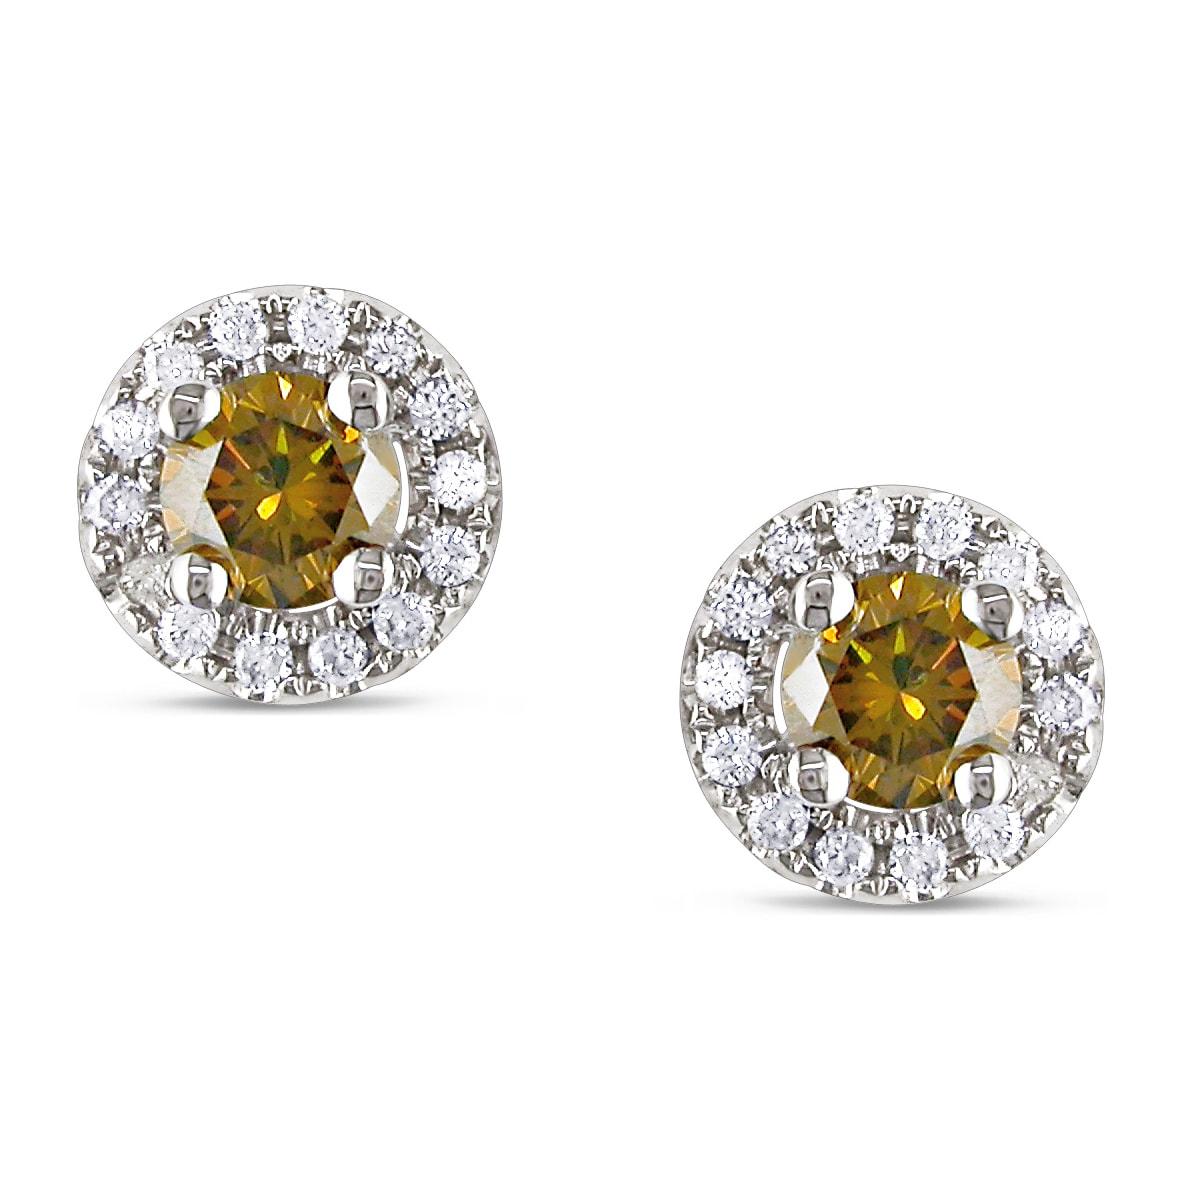 Miadora 14k White Gold 3/5ct TDW Cognac and White Diamond Halo Earrings(G-H, SI2)